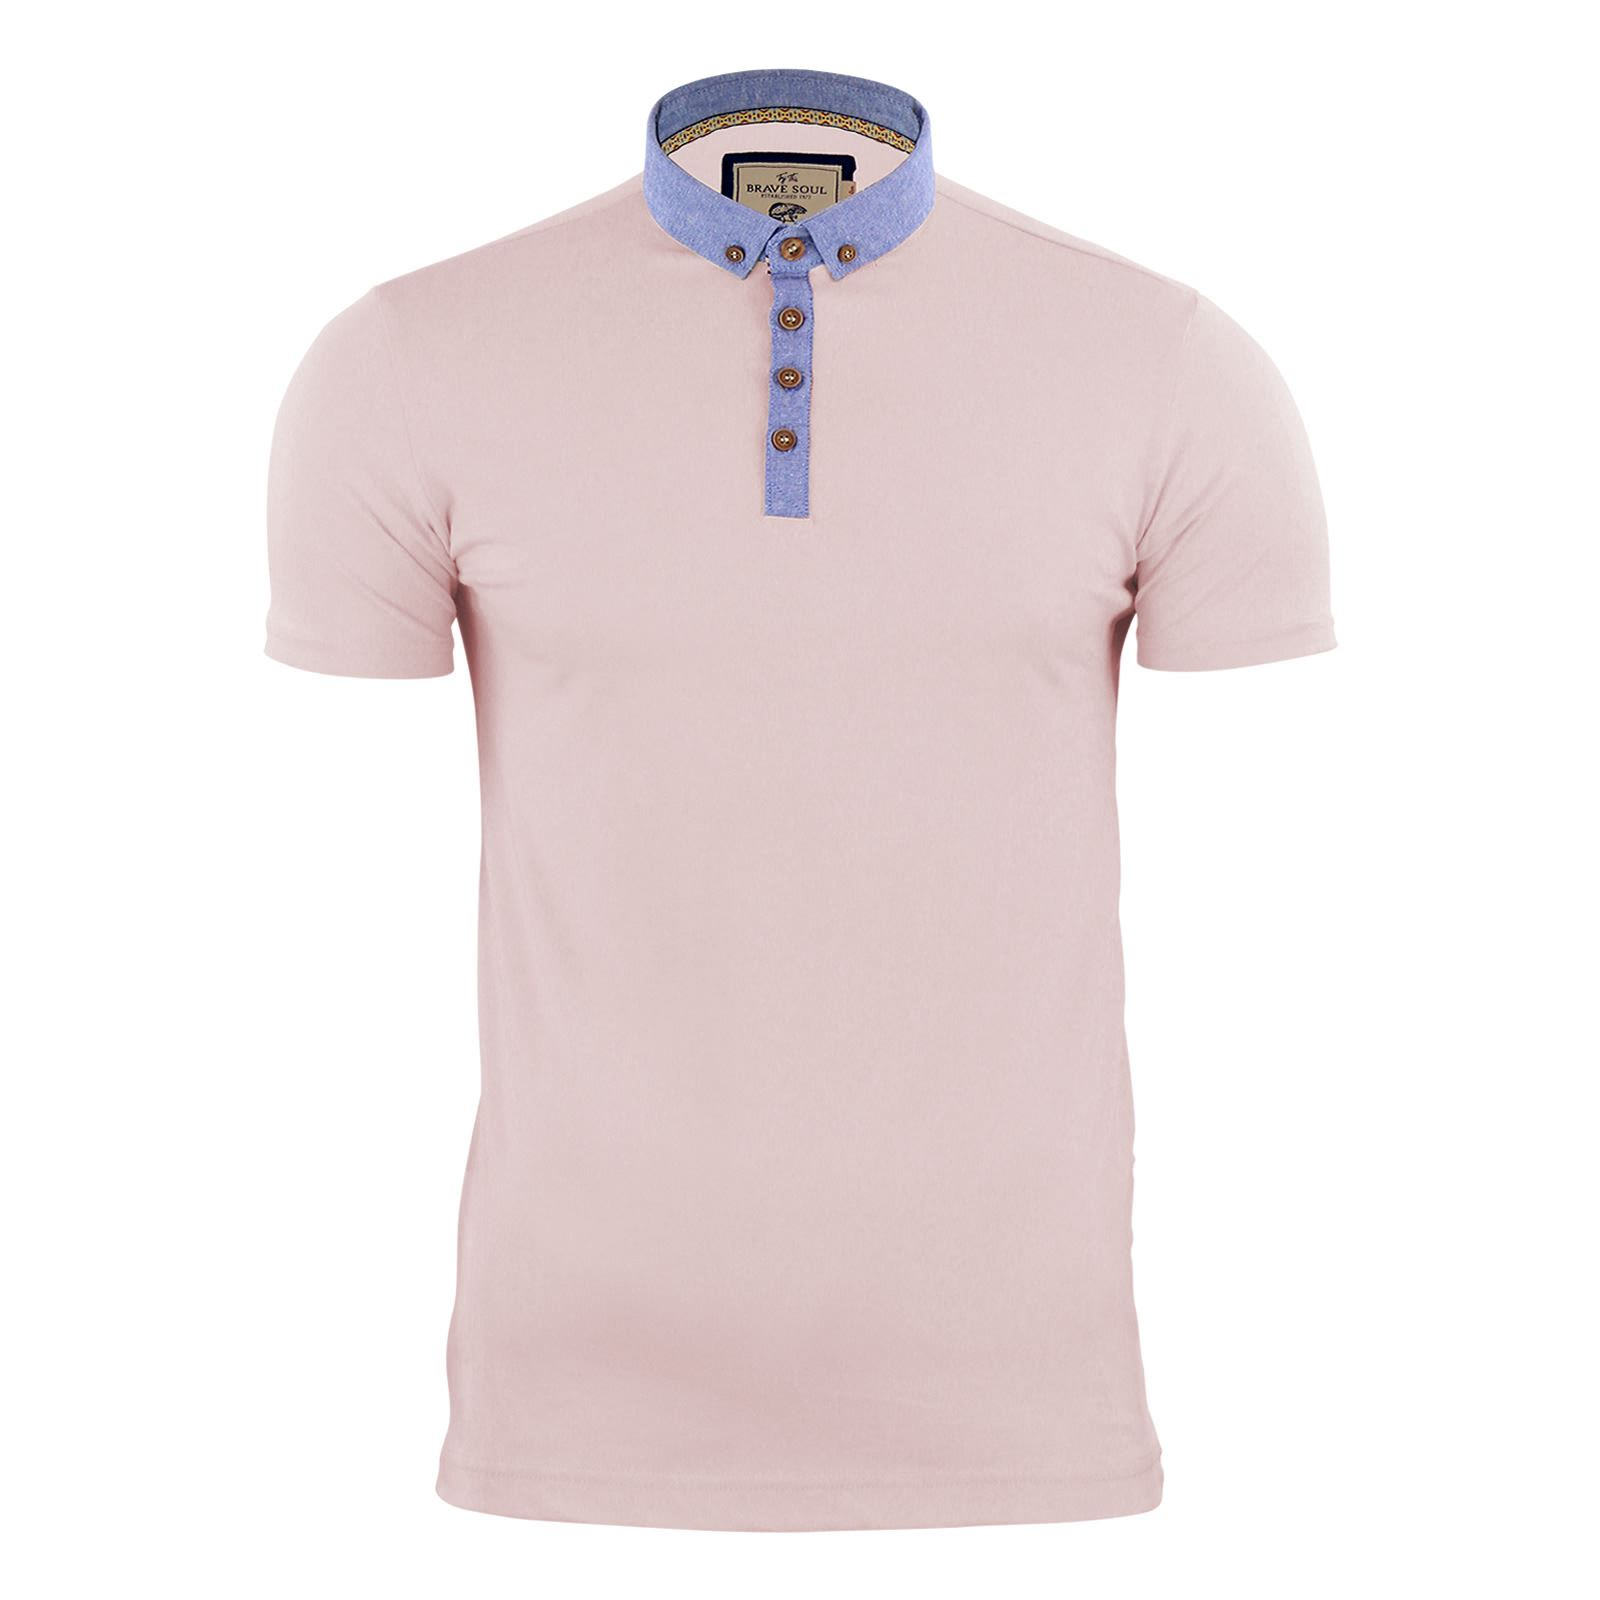 Para-Hombre-Polo-T-Shirt-Alma-valiente-Glover-Algodon-Con-Cuello-Y-Manga-Corta-Casual-Top miniatura 48